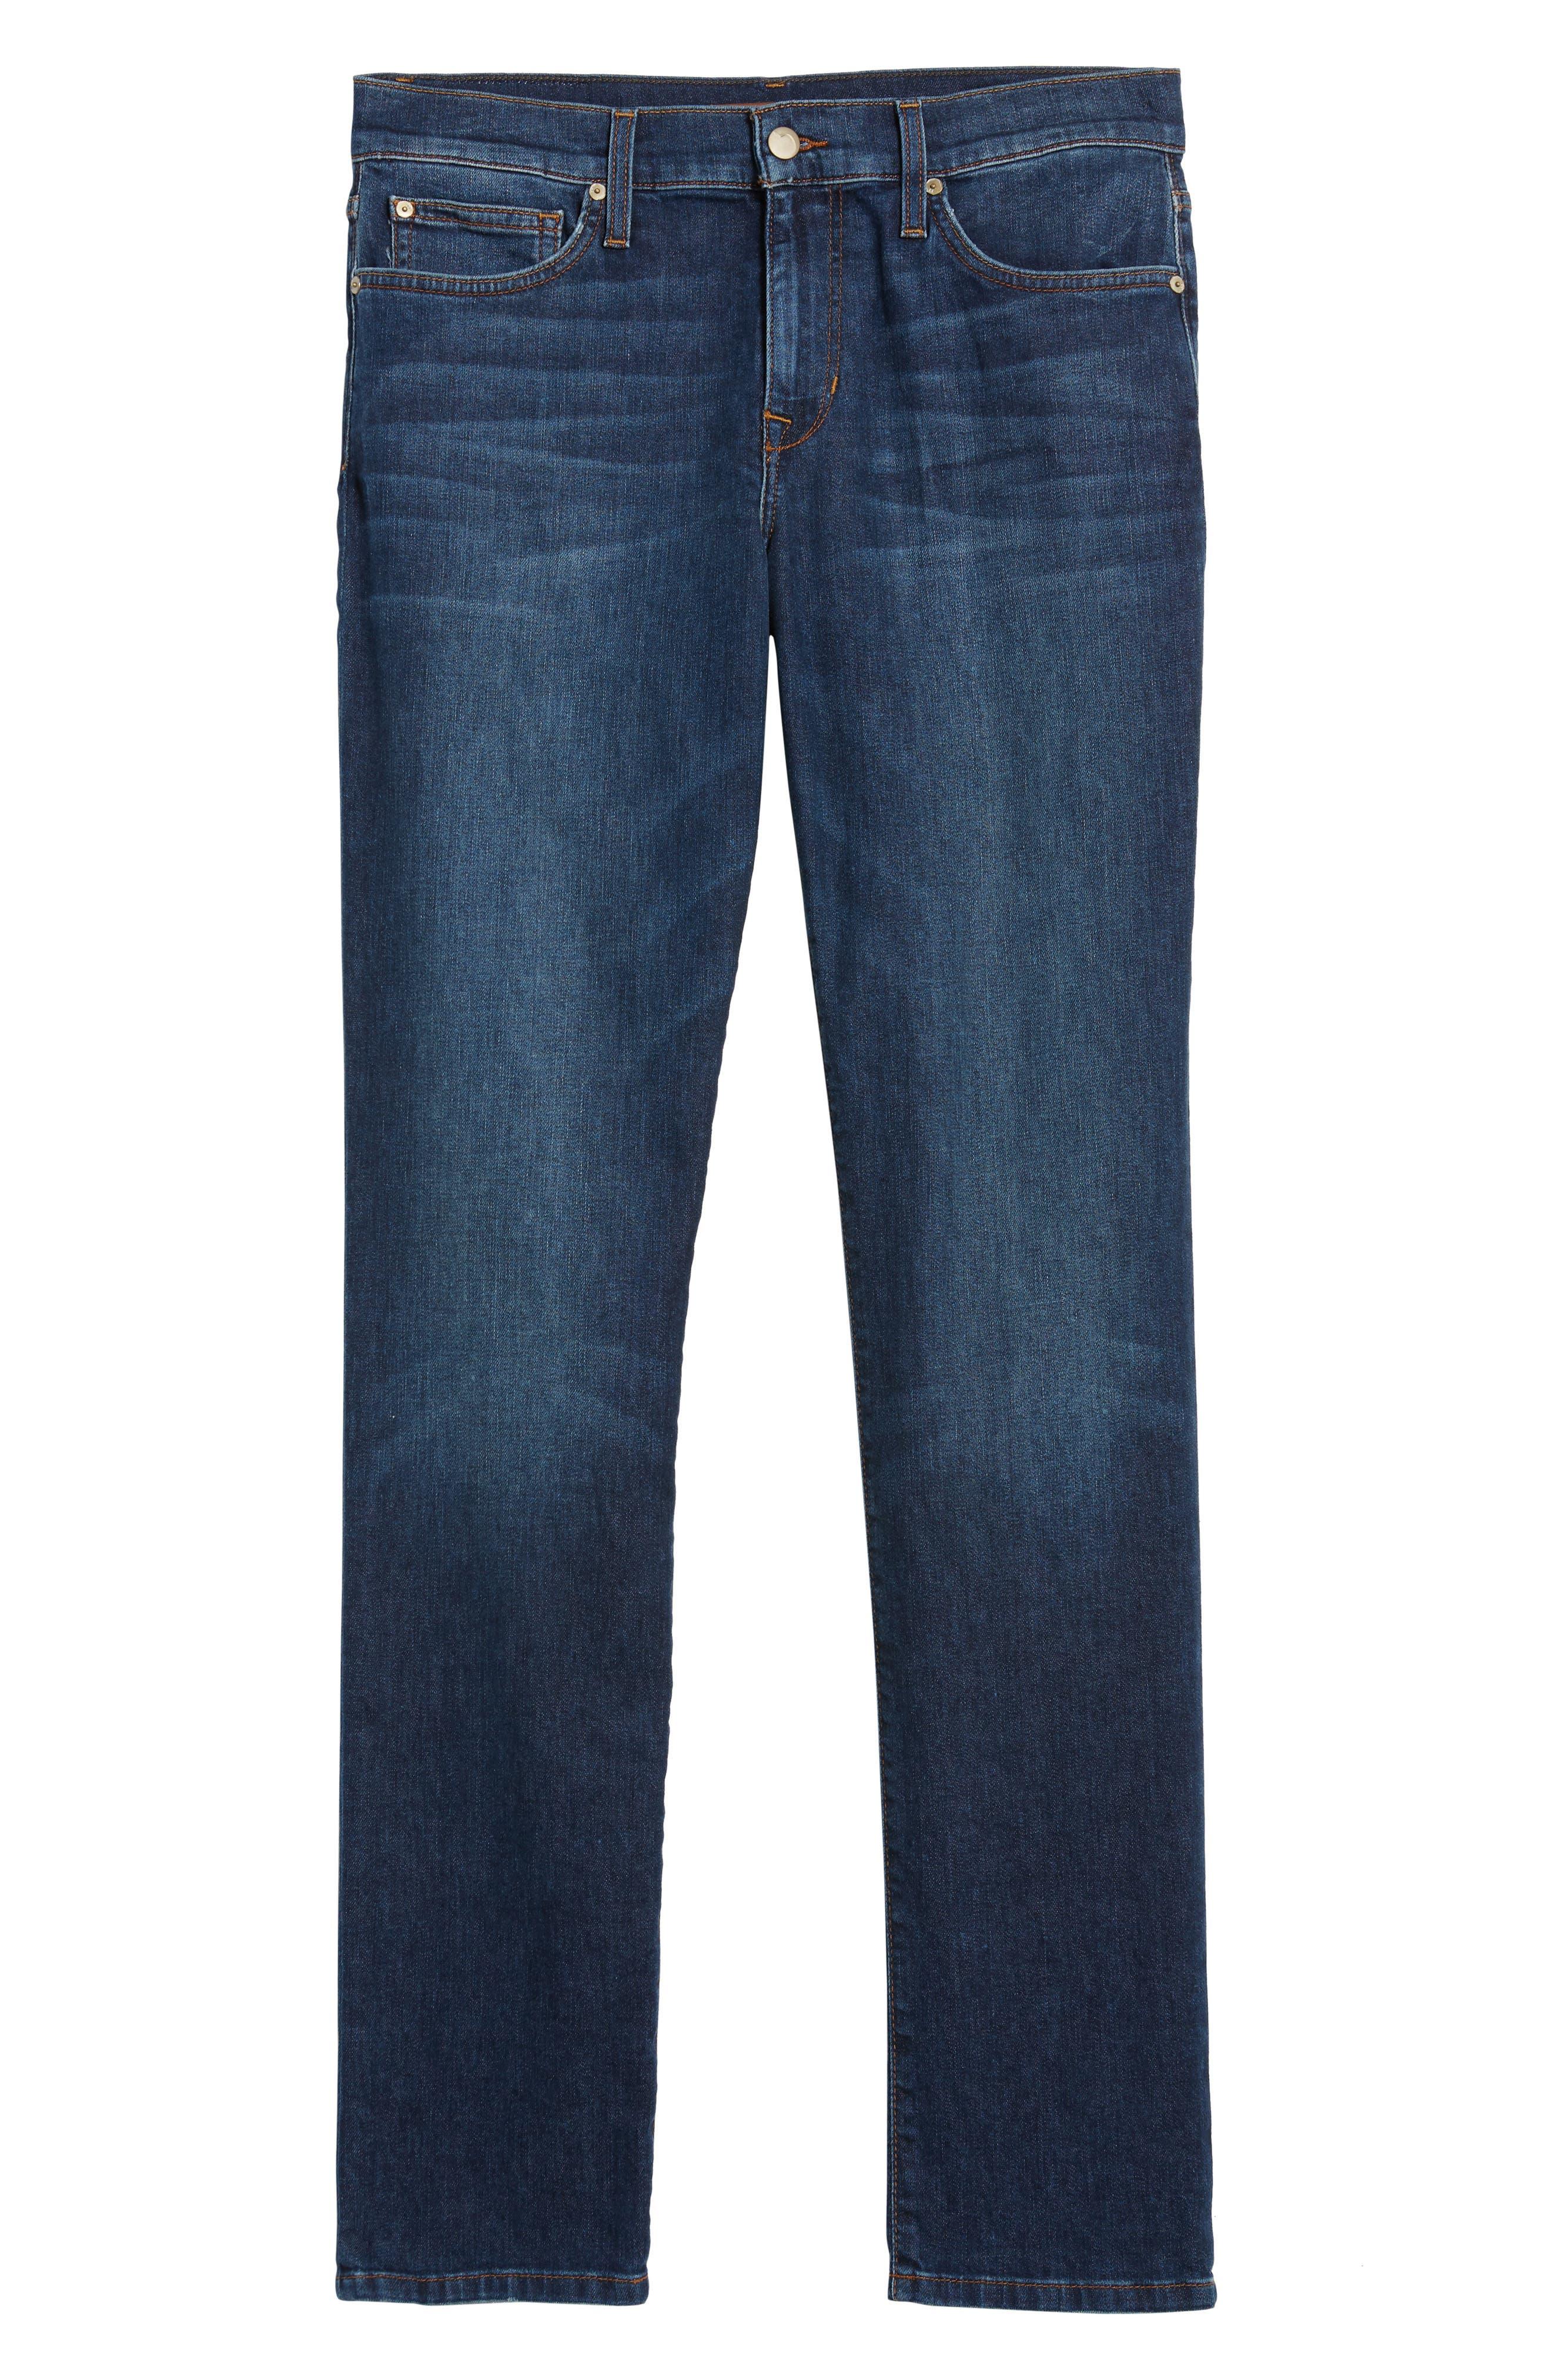 Slim Fit Jeans,                             Alternate thumbnail 6, color,                             Yates